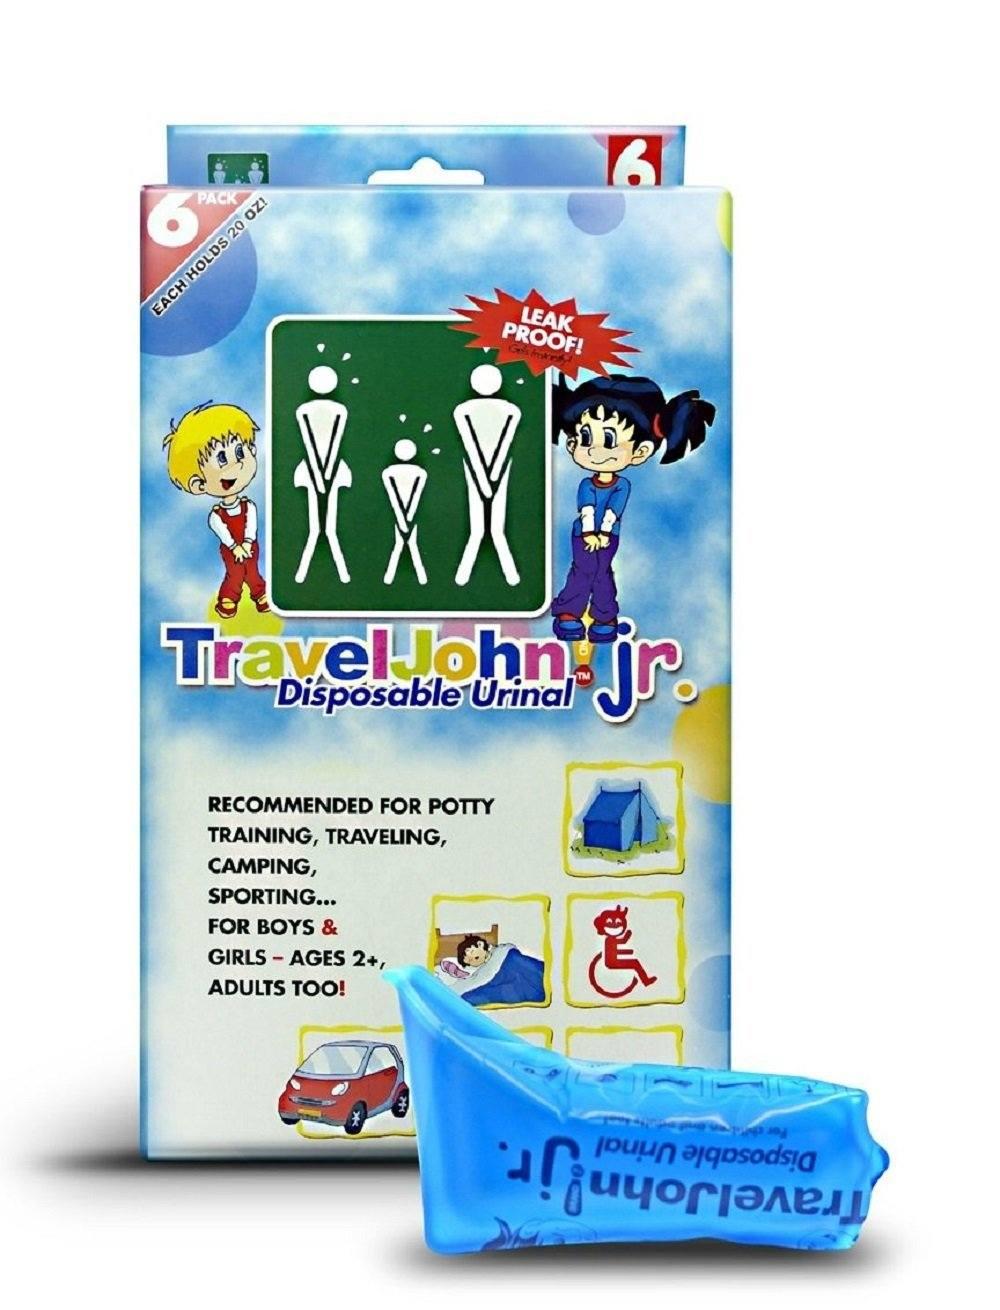 TravelJohn Jr.-Disposable Urinal Bags